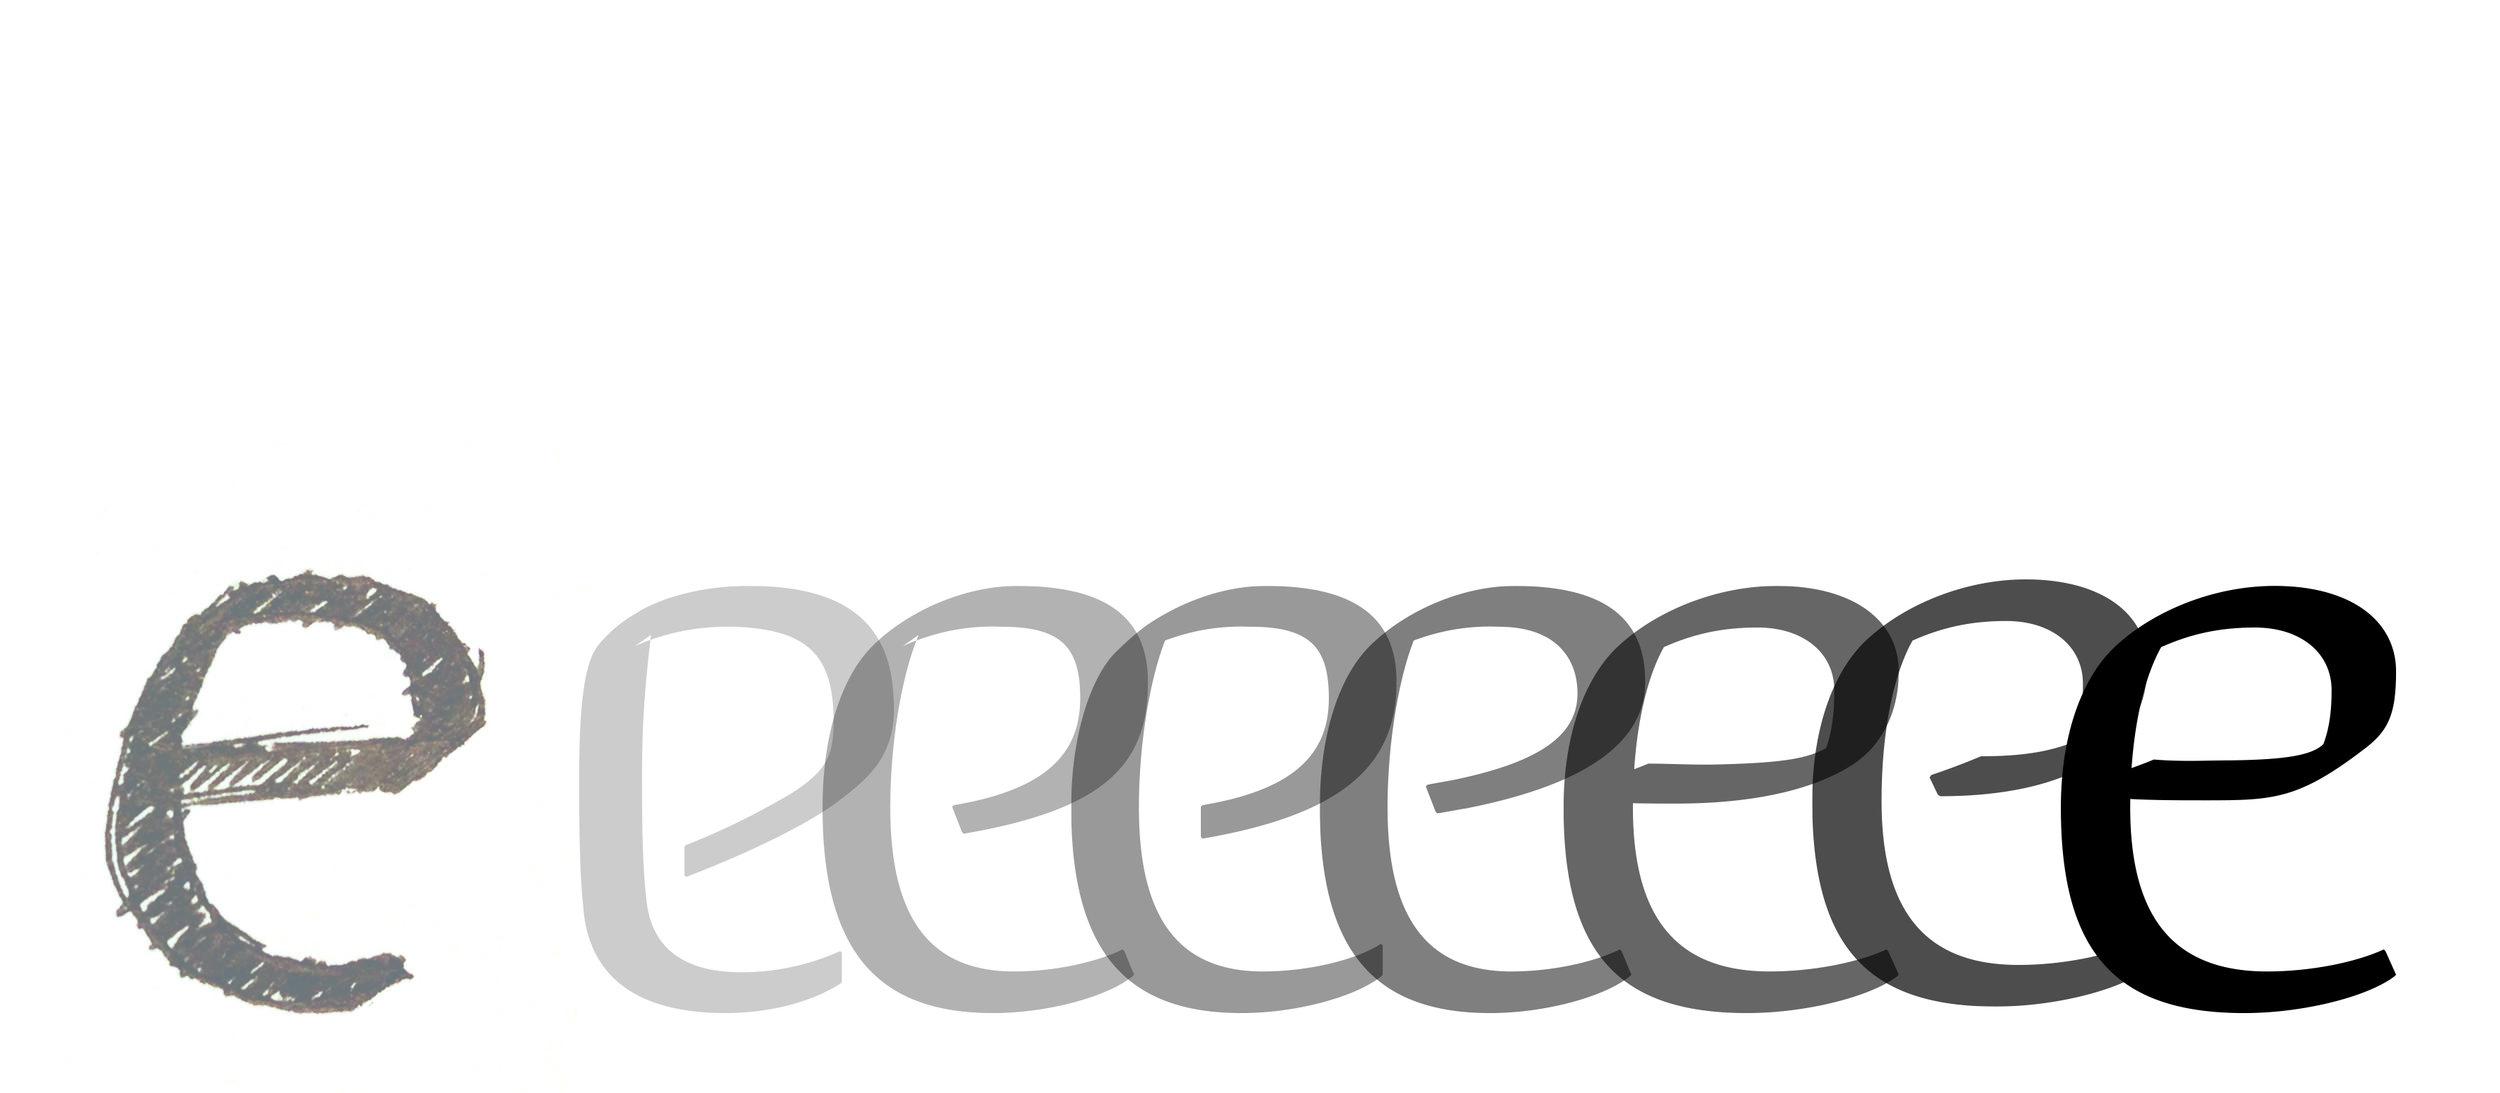 Sketch → Round 1 Digitizing → etc. etc. →Final